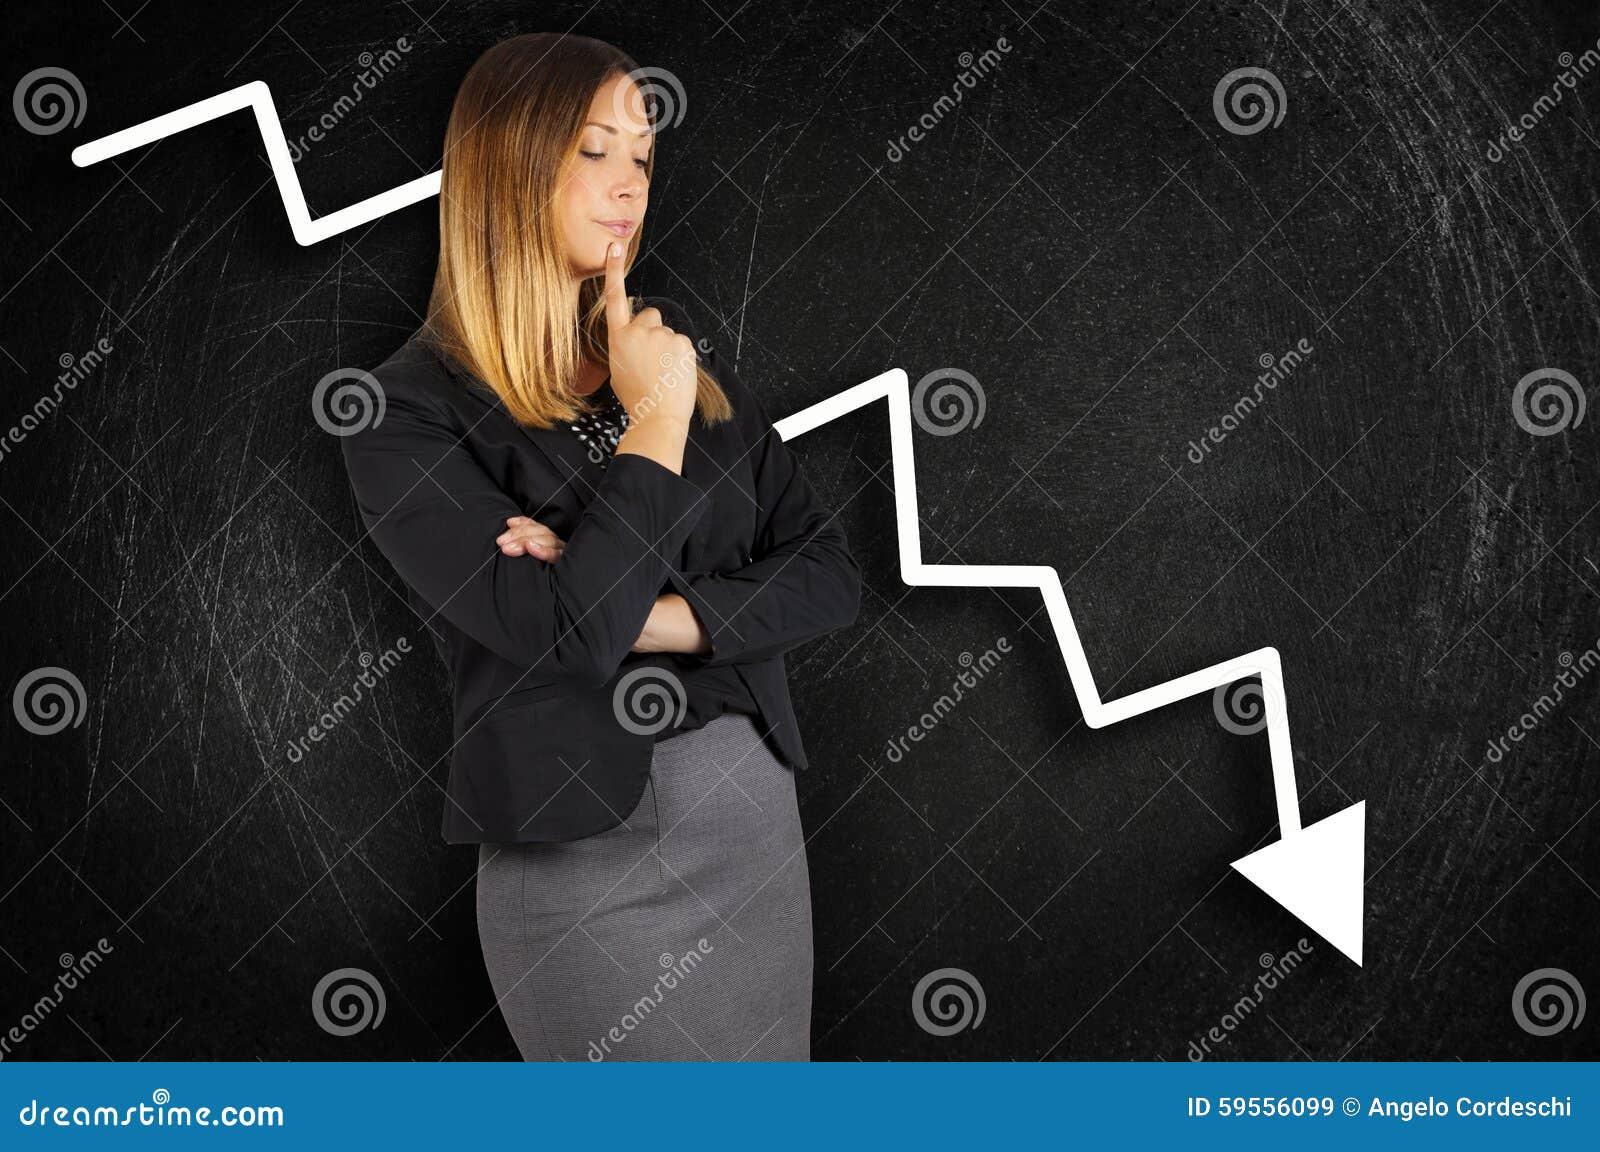 Crisis. Chart loss. Business woman worried